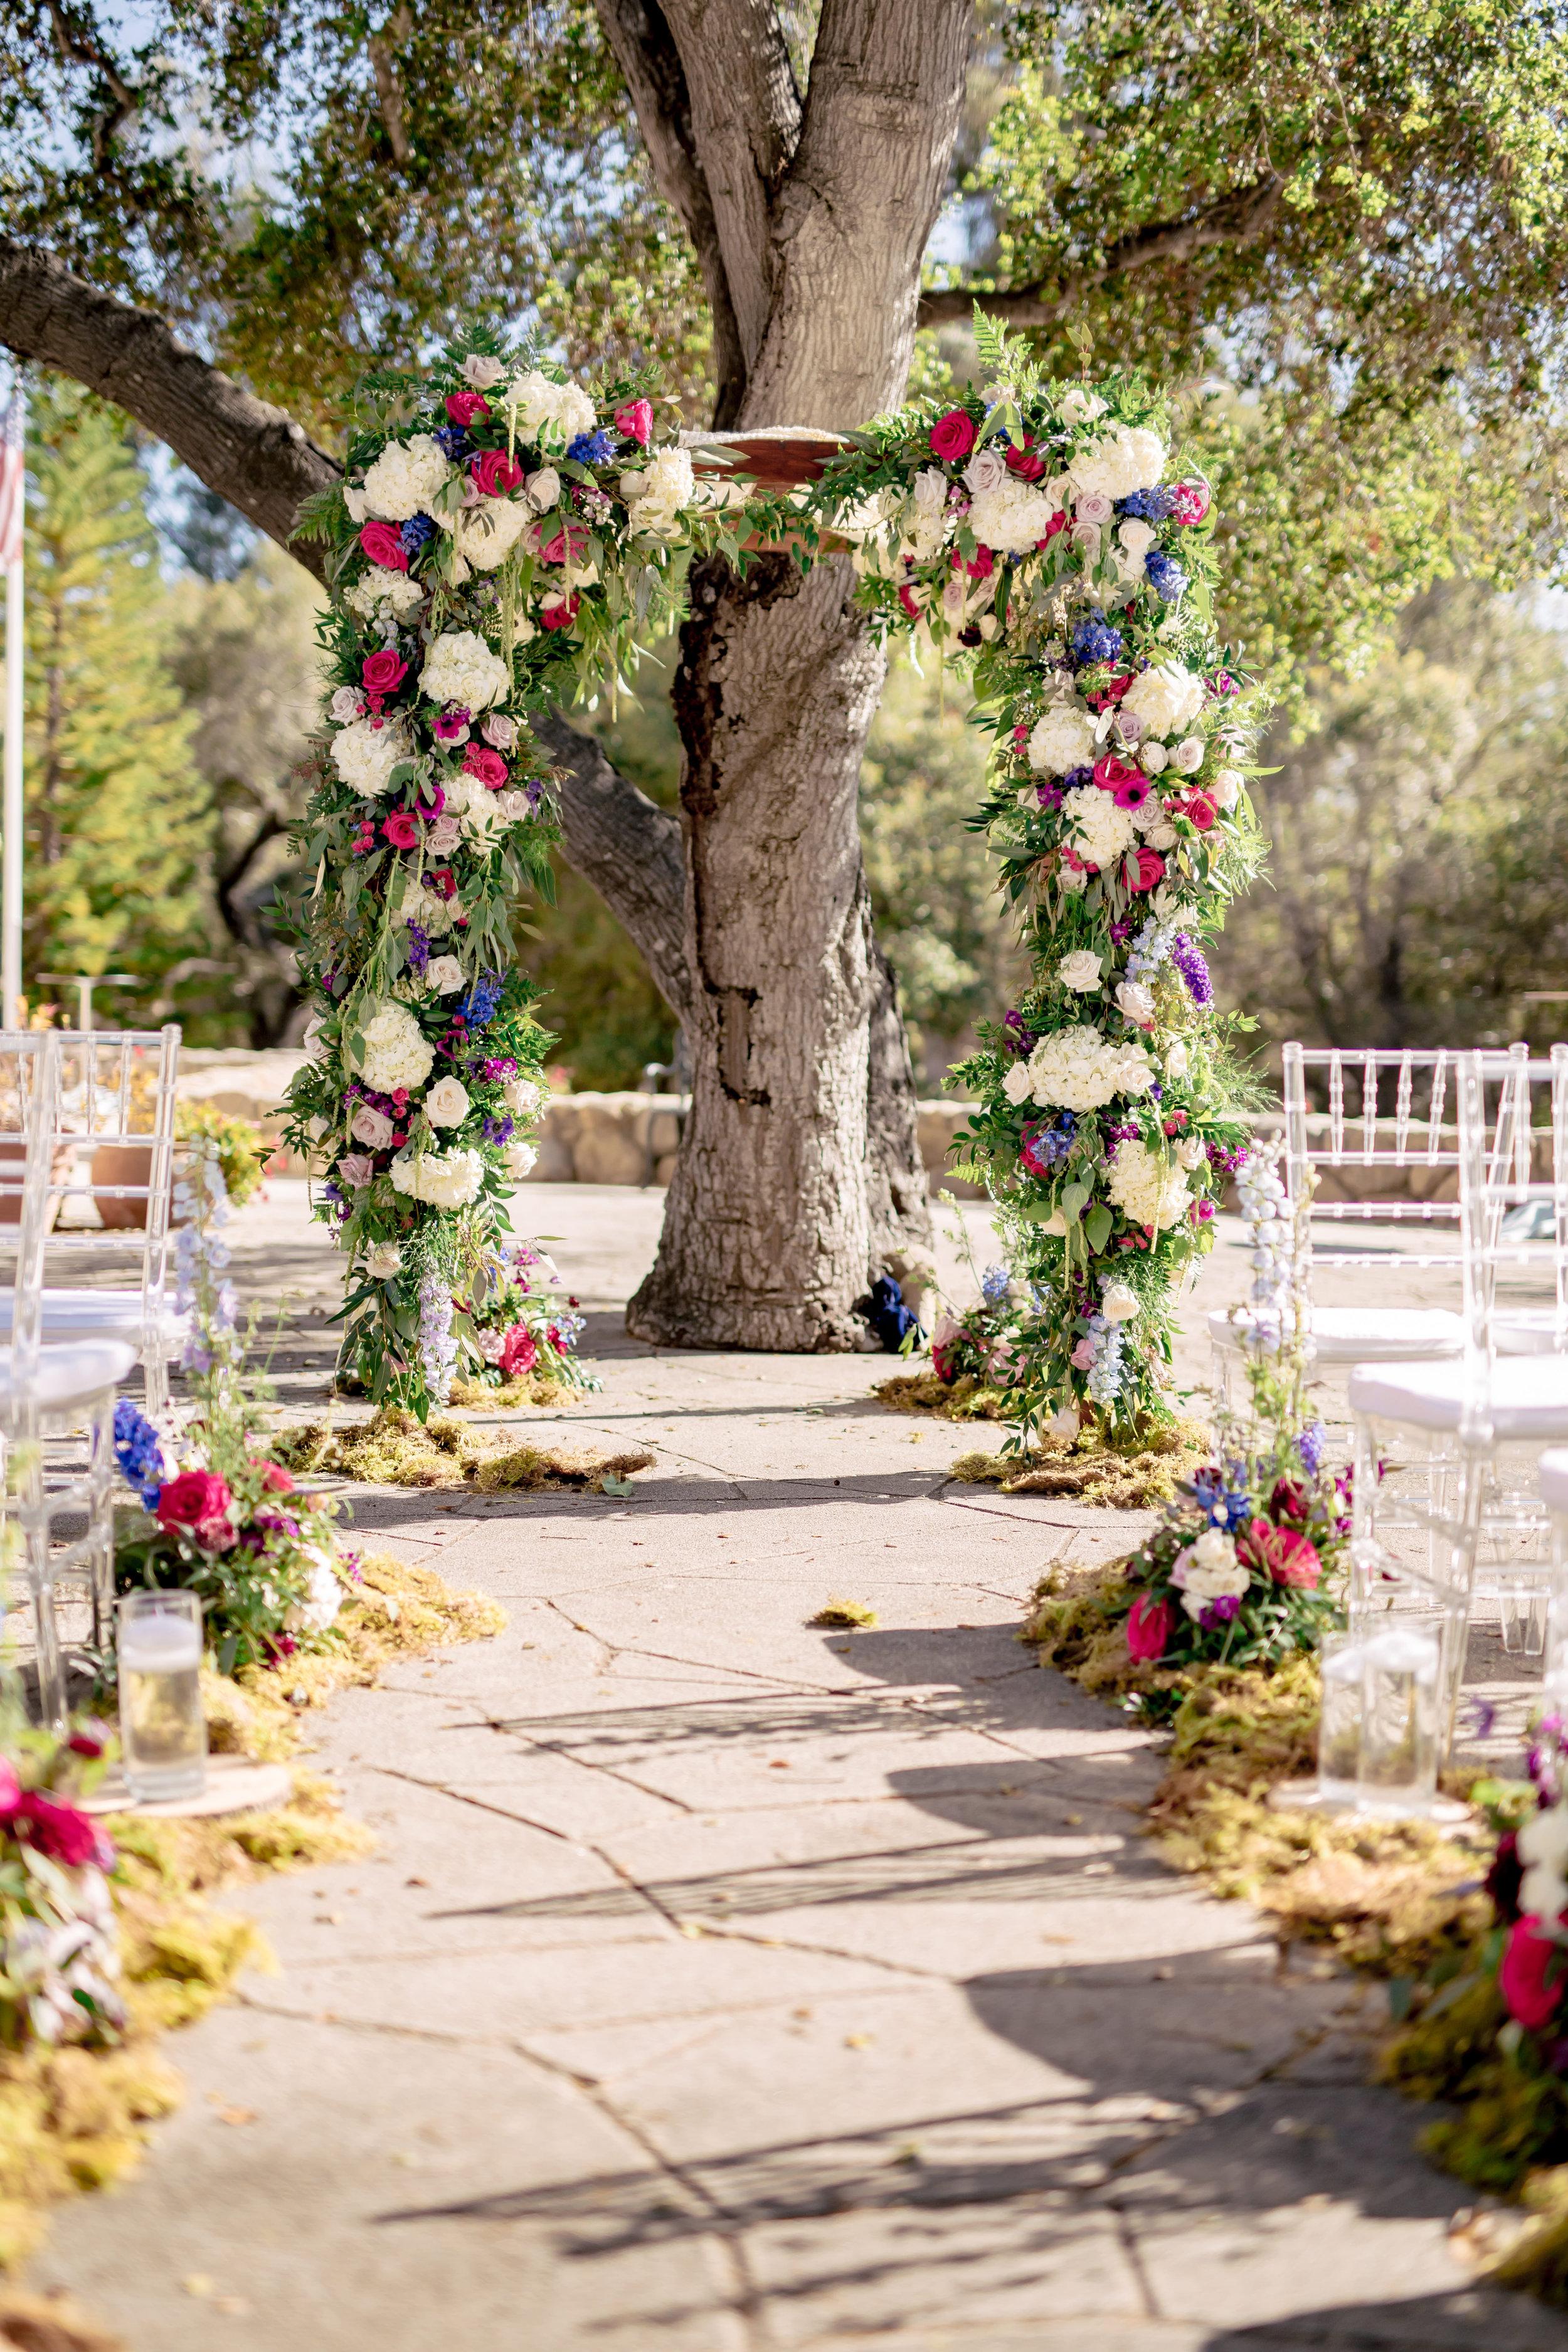 www.santabarbarawedding.com | Rewind Photography | Rockwood Women's Club | Burlap & Bordeaux | Amigo Party Rental | Flower Arbor